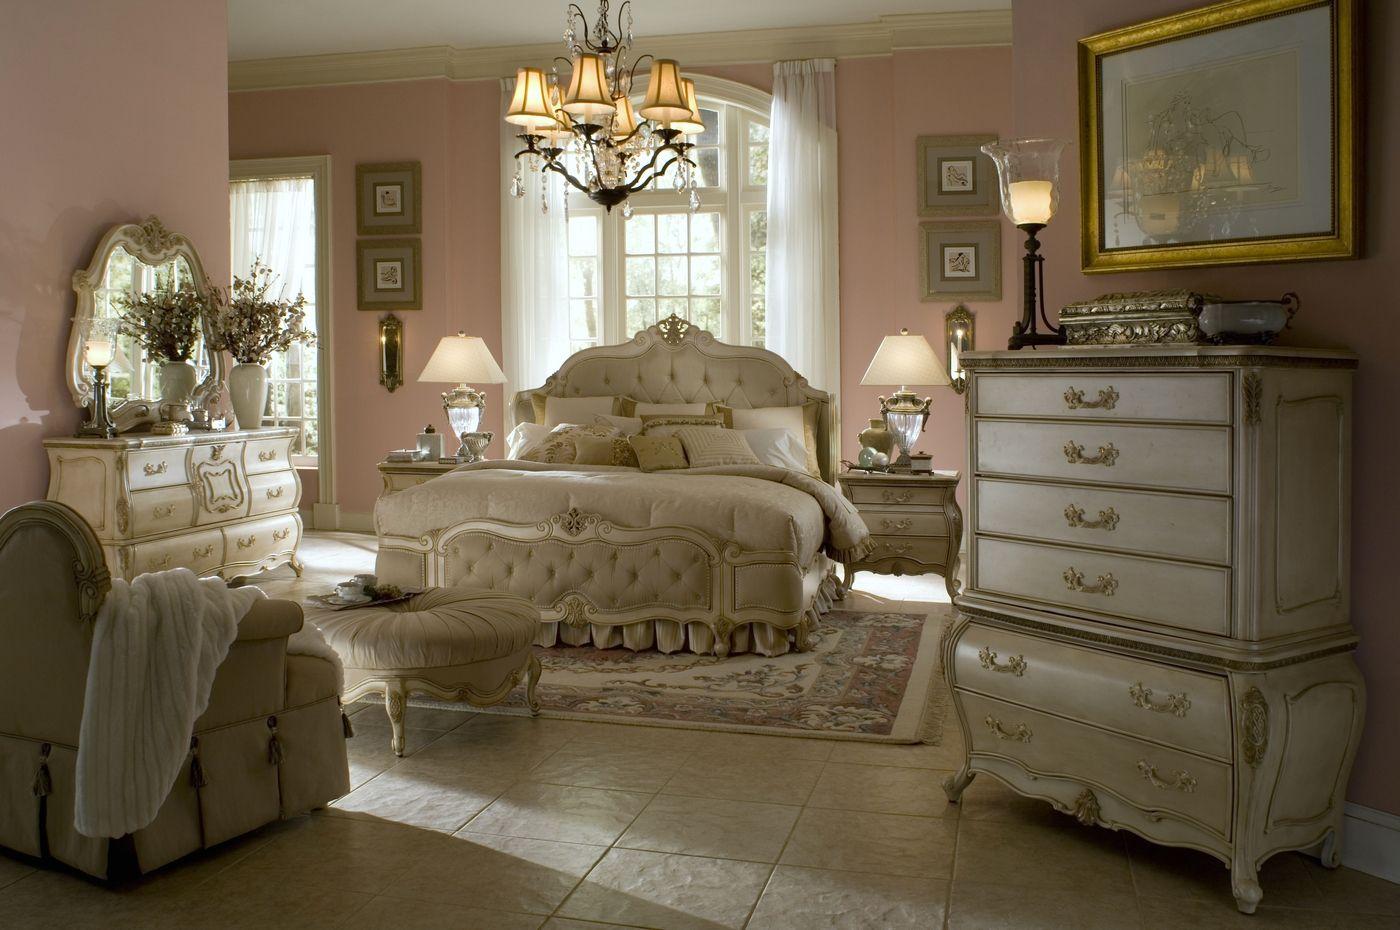 Michael Amini Lavelle Antique White Finish Luxury Bedroom Set by AICO - Michael Amini Lavelle Antique White Finish Luxury Bedroom Set By